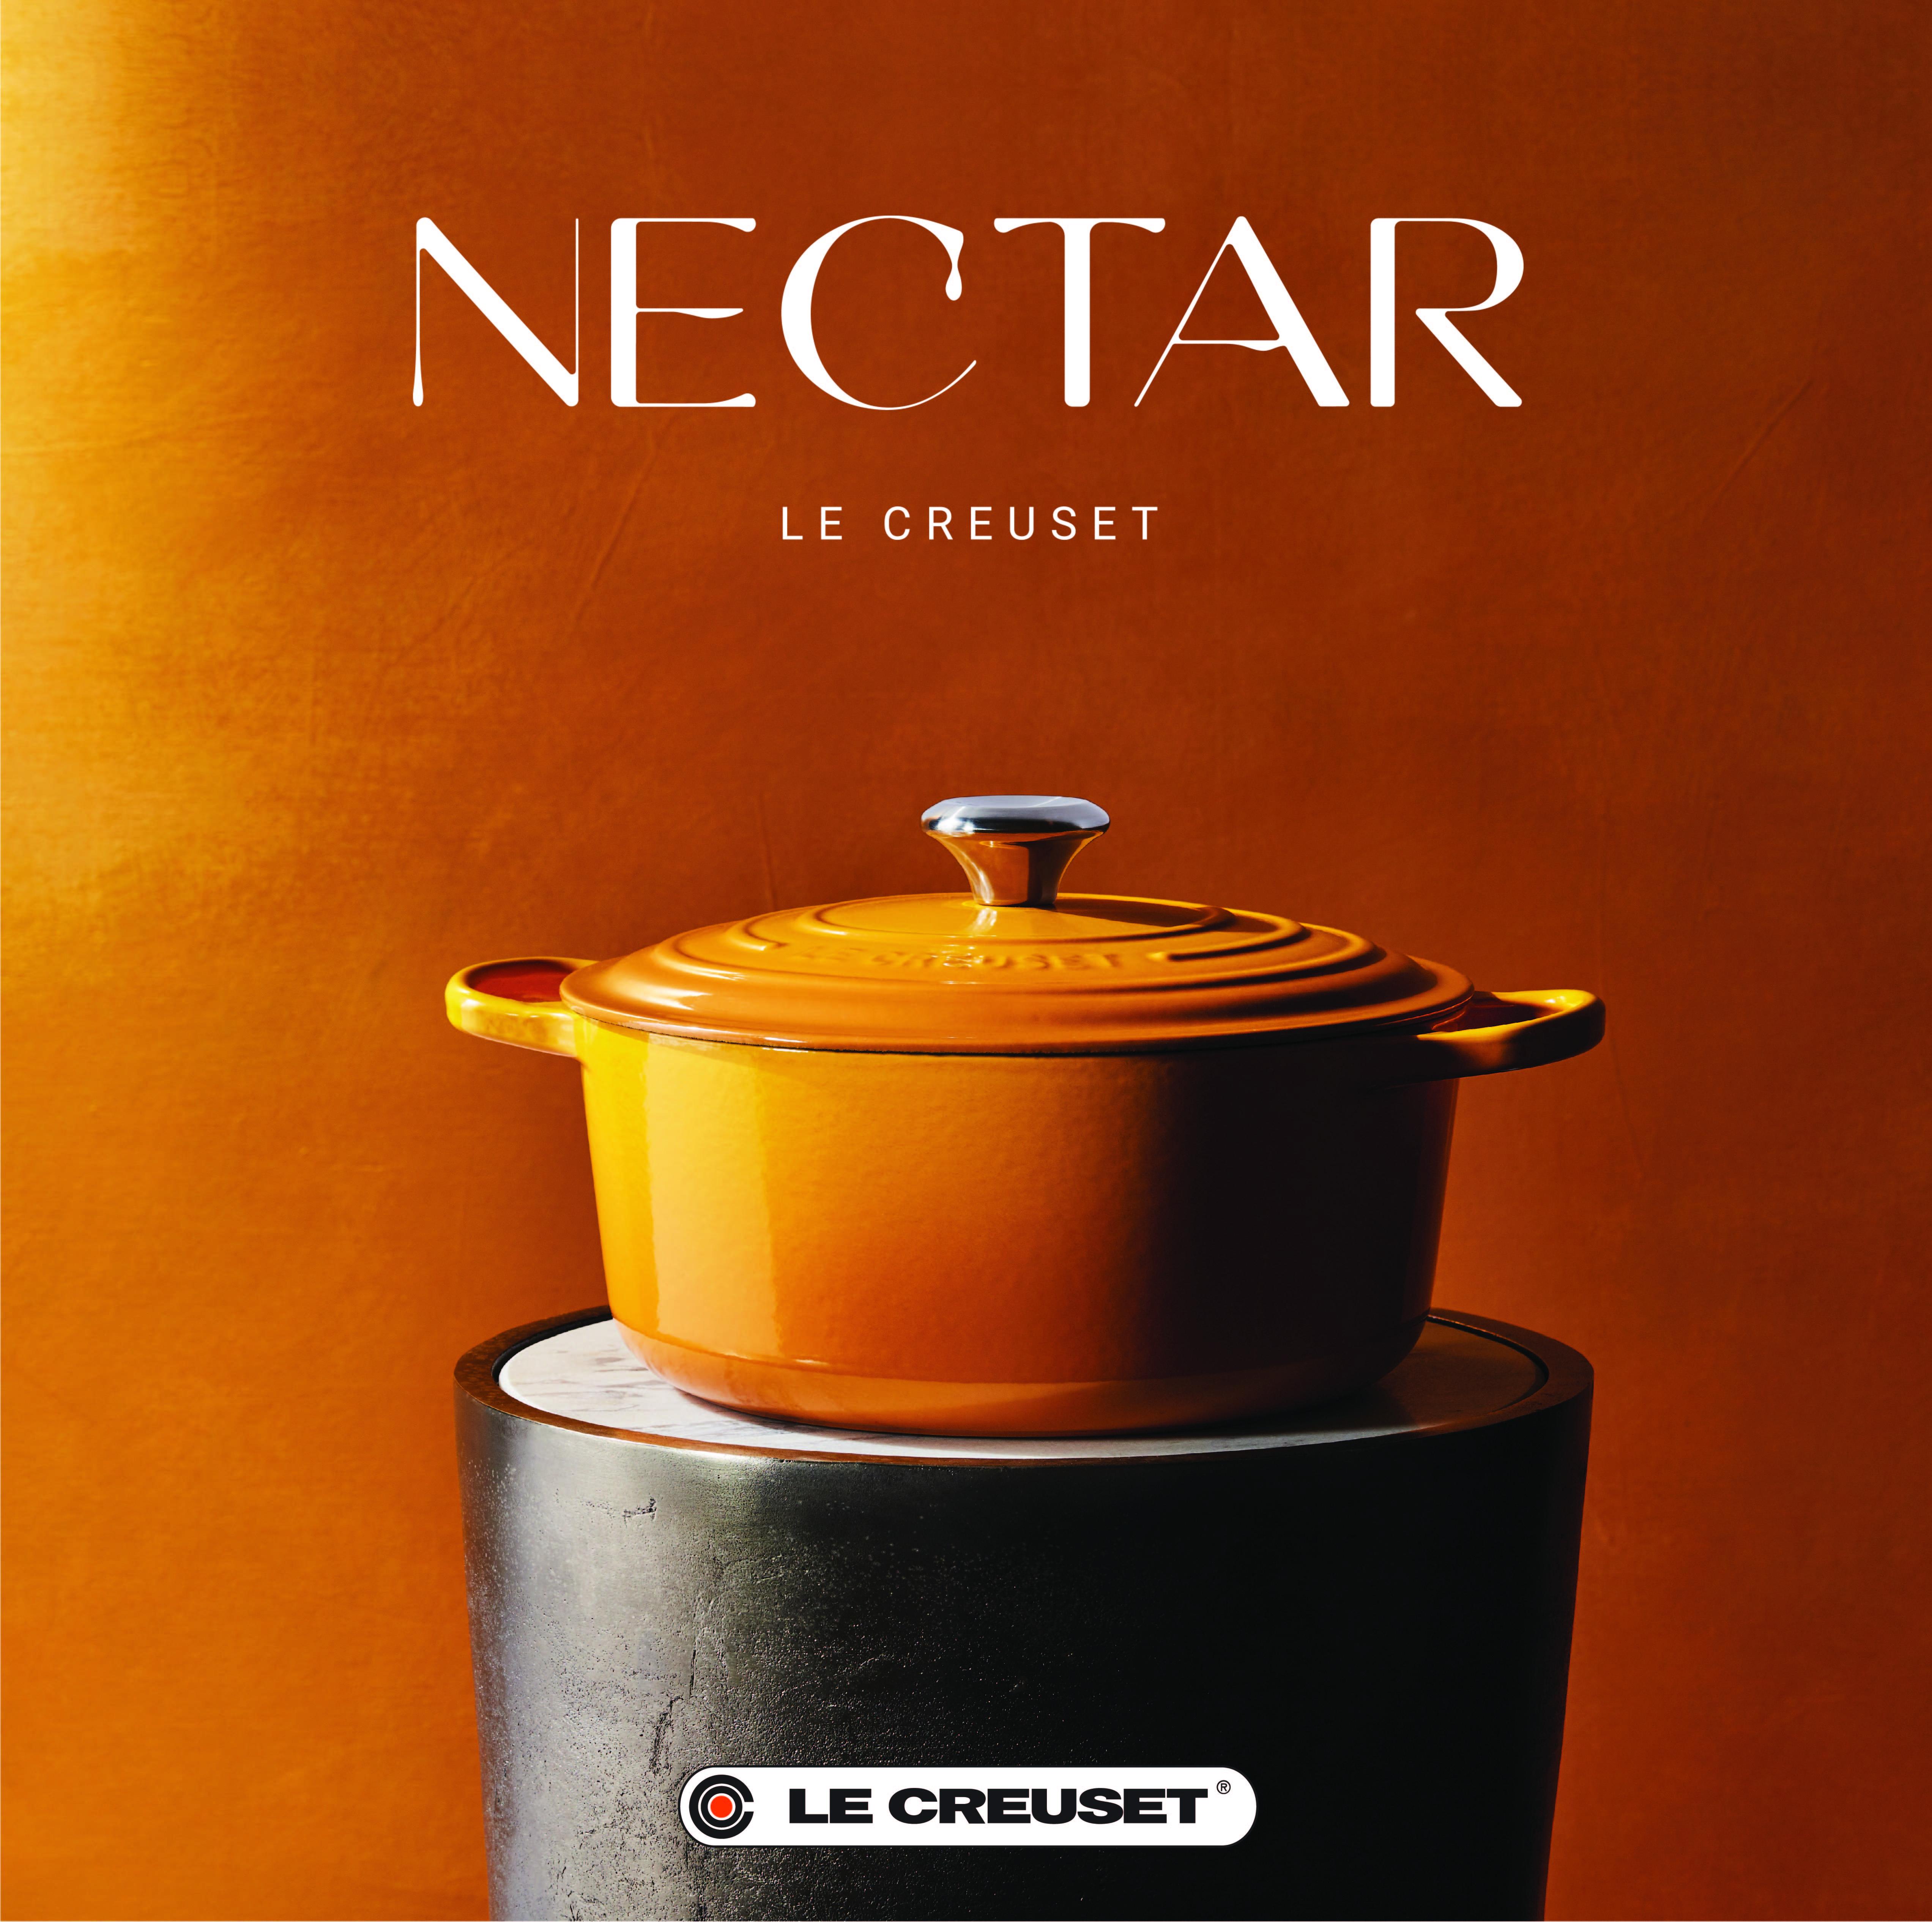 Nectar by Le Creuset